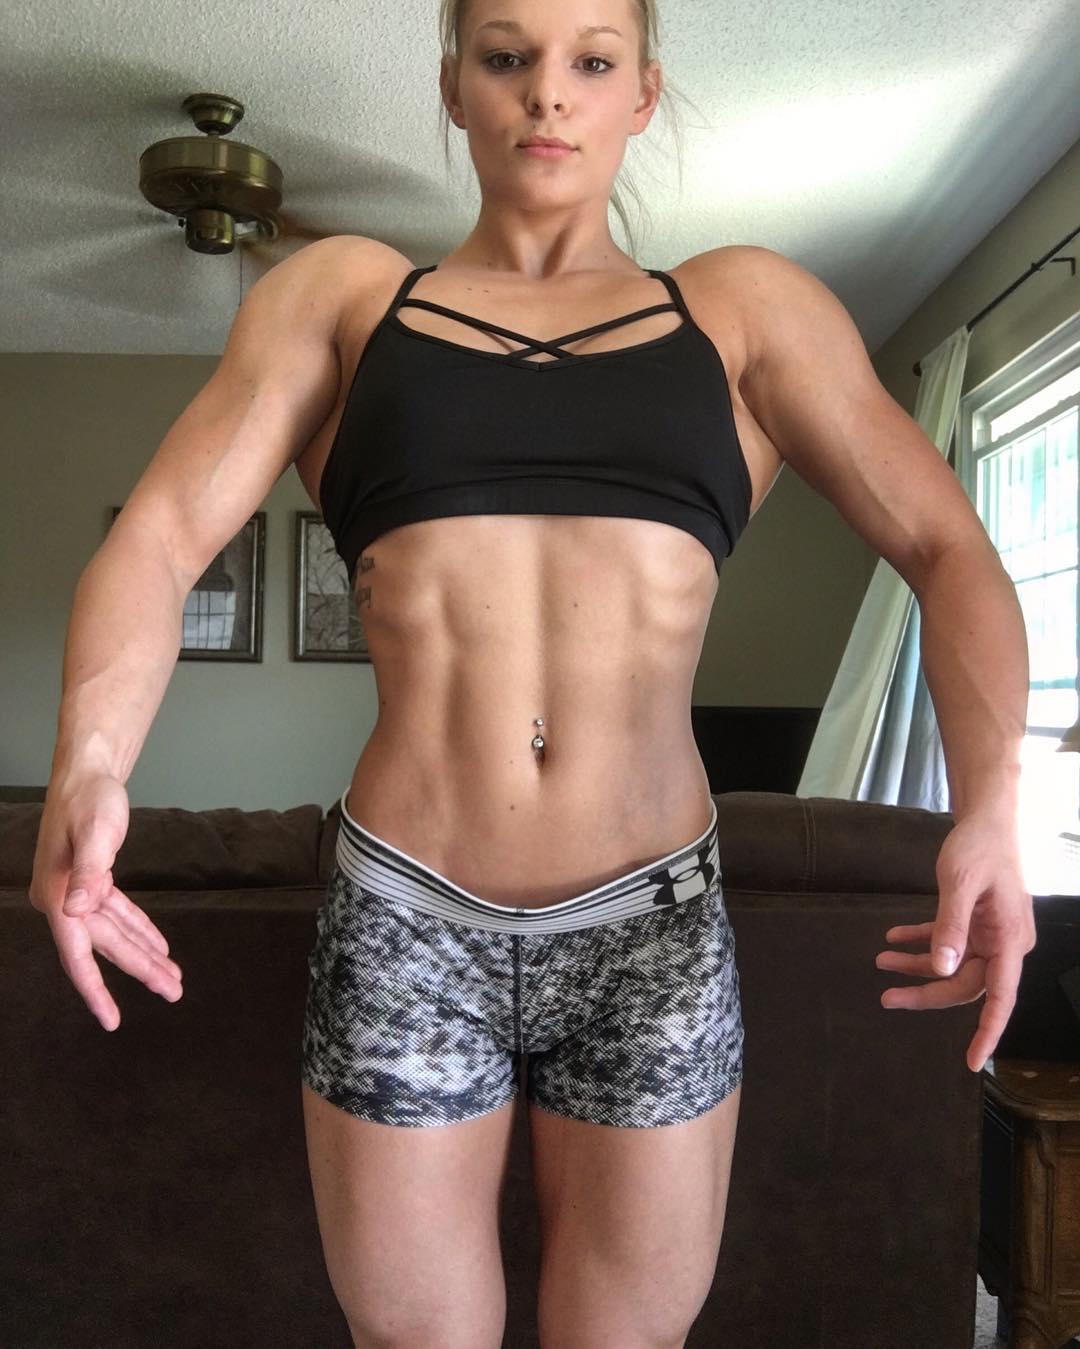 young-muscle-girl-nude